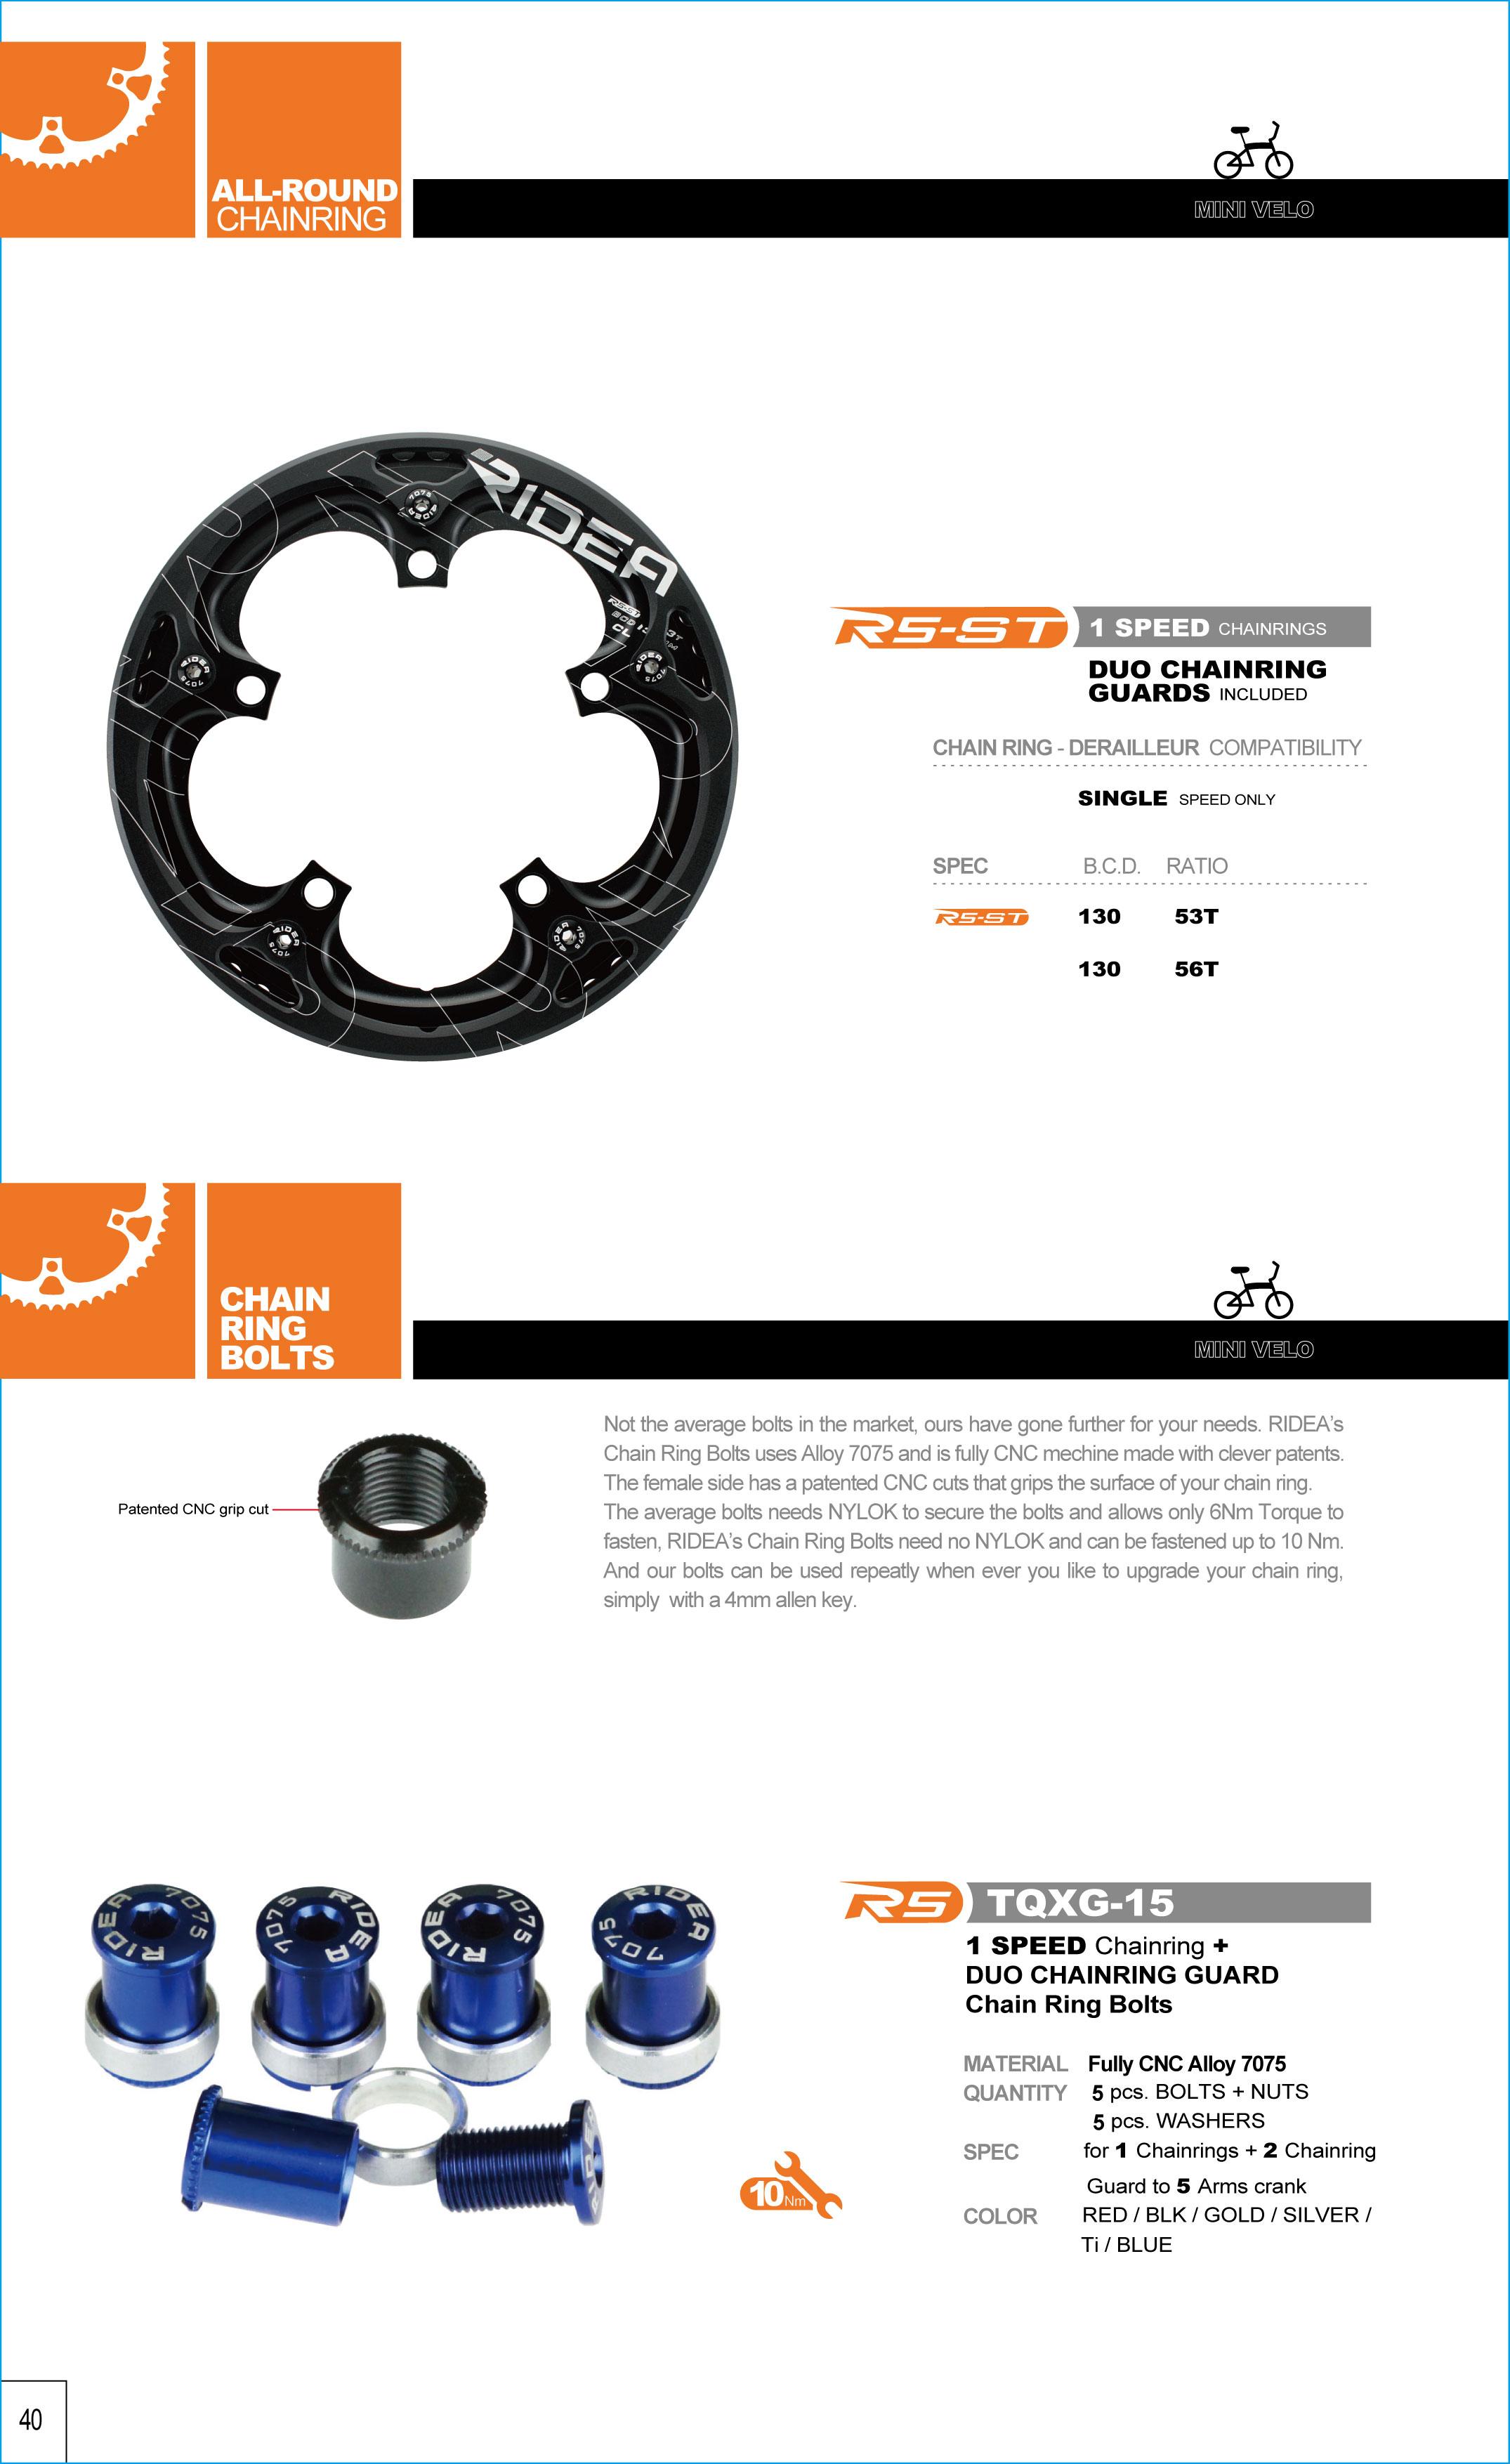 Taiwan Baut Chainring Sepeda Lipat Tqxg 15 Suku Cadang Bolt Chain Ring Folding Bike B069mb